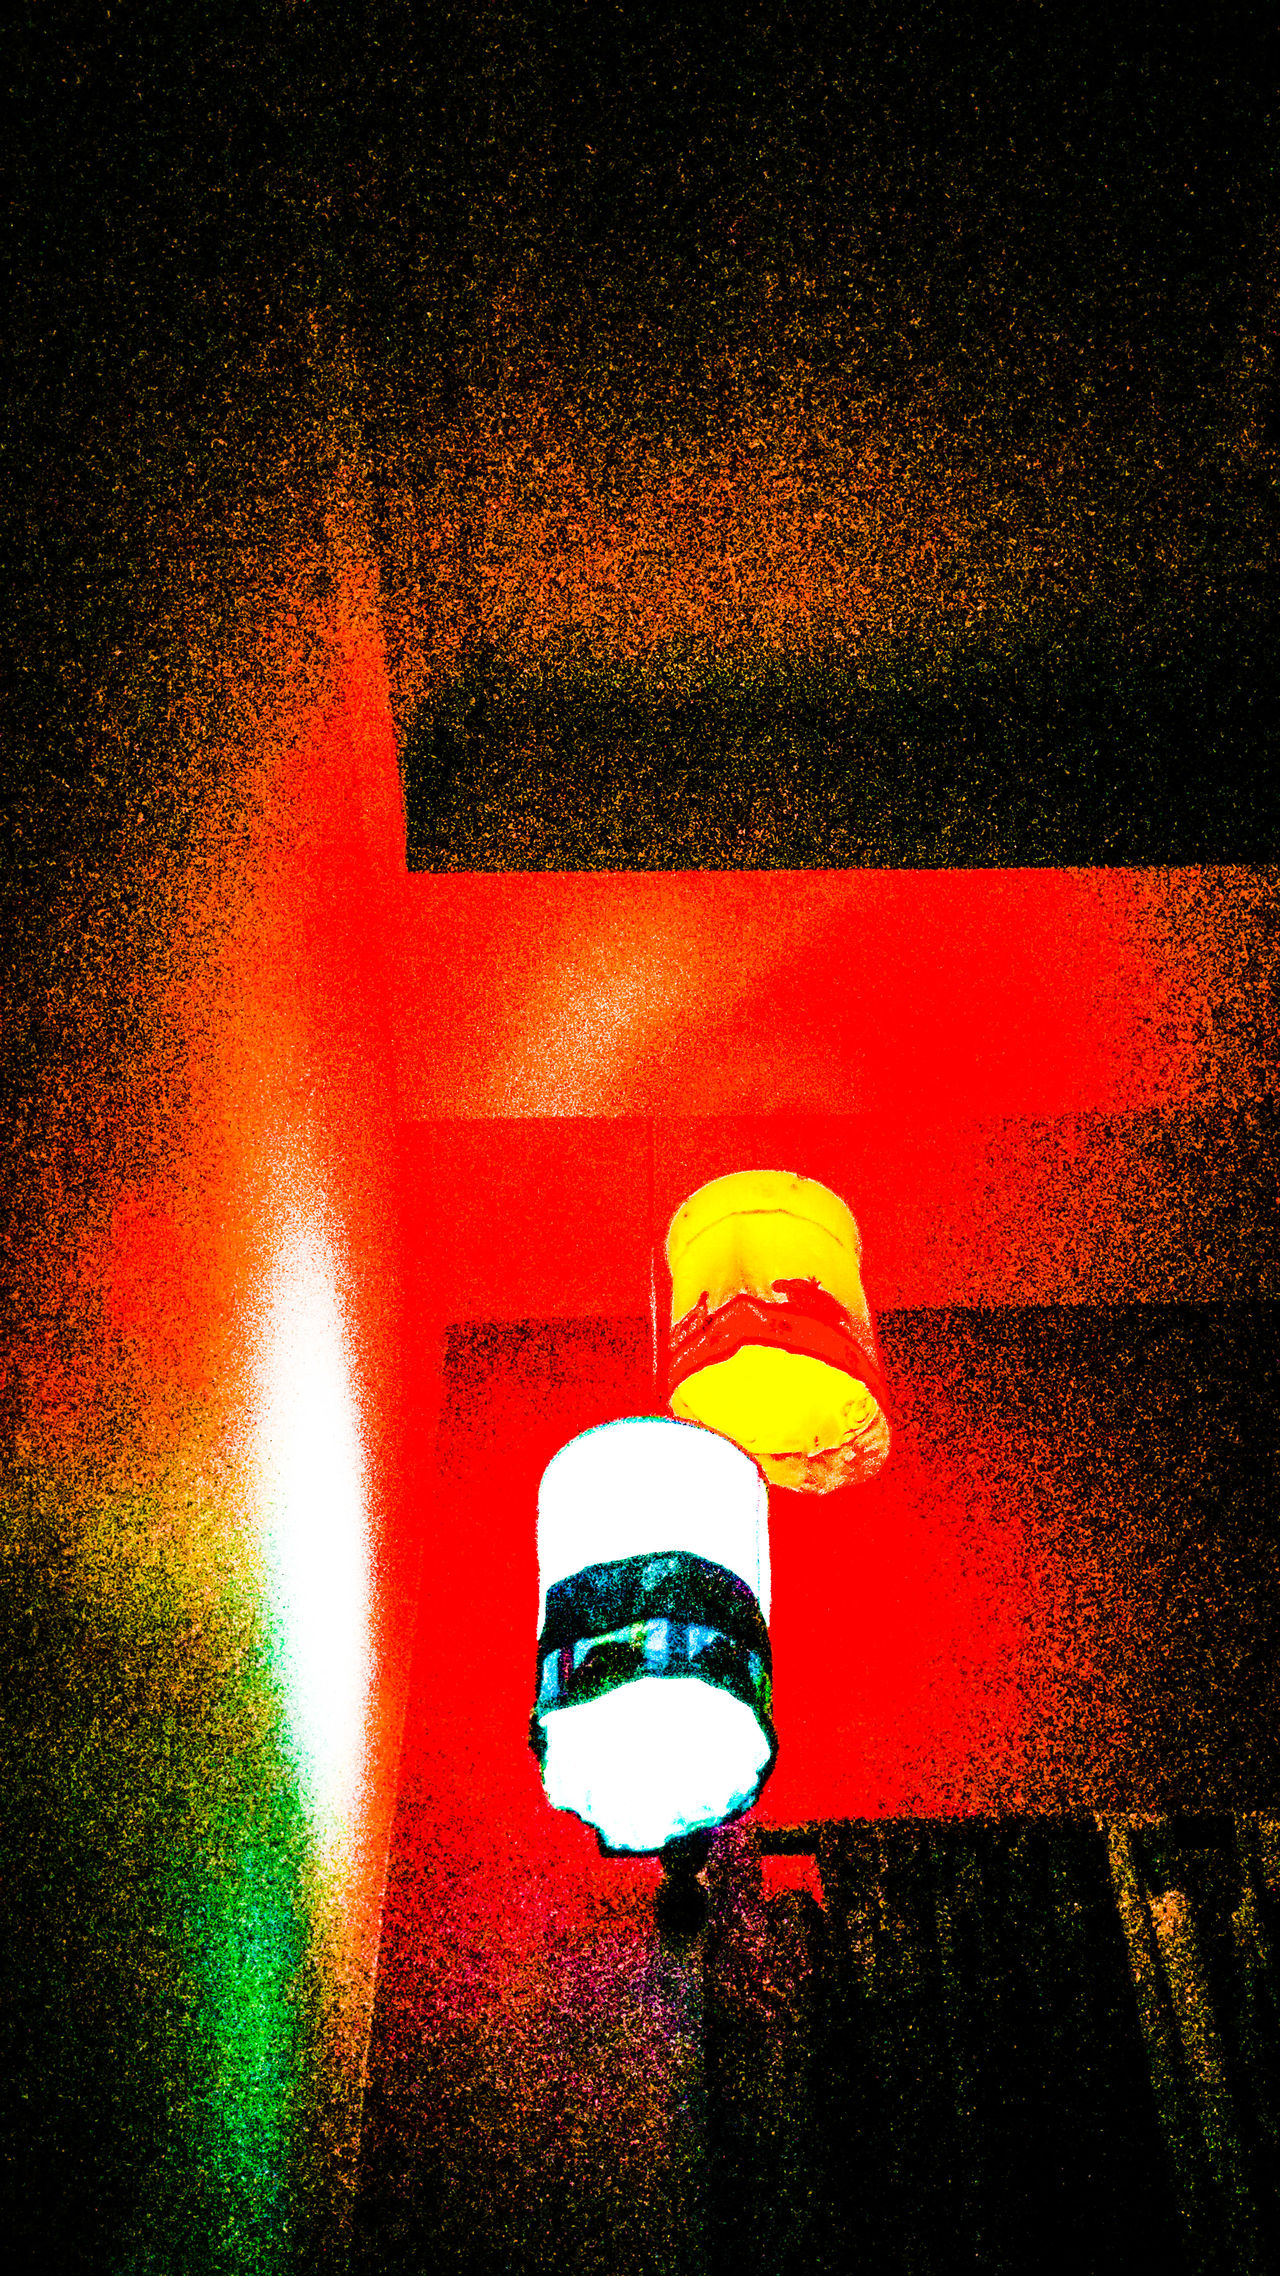 Some Nights.. AtNight Lamps Lampshade Hanging Itisaphoto Redandblue Lights Grainy MyRoom Corner Hanginglamps Eyeforphotography EyeEm Gallery Itsnotapainting